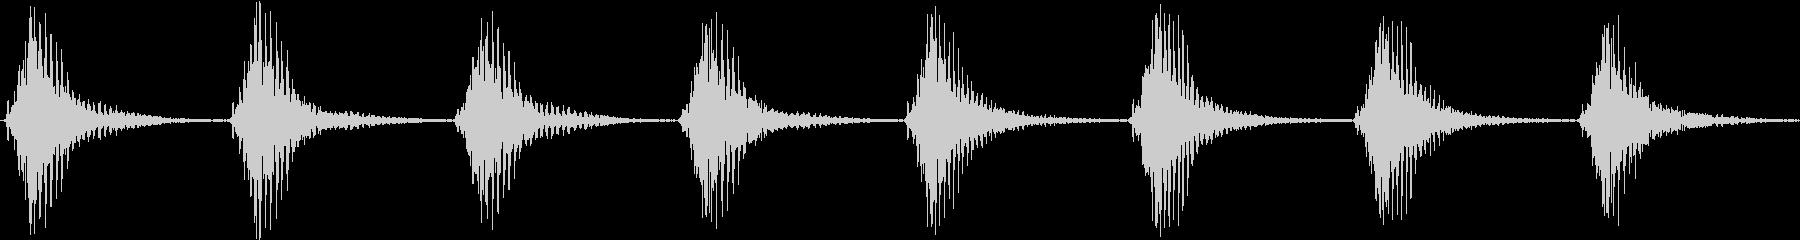 Cartoon アメコミ 煽り劇伴 4の未再生の波形